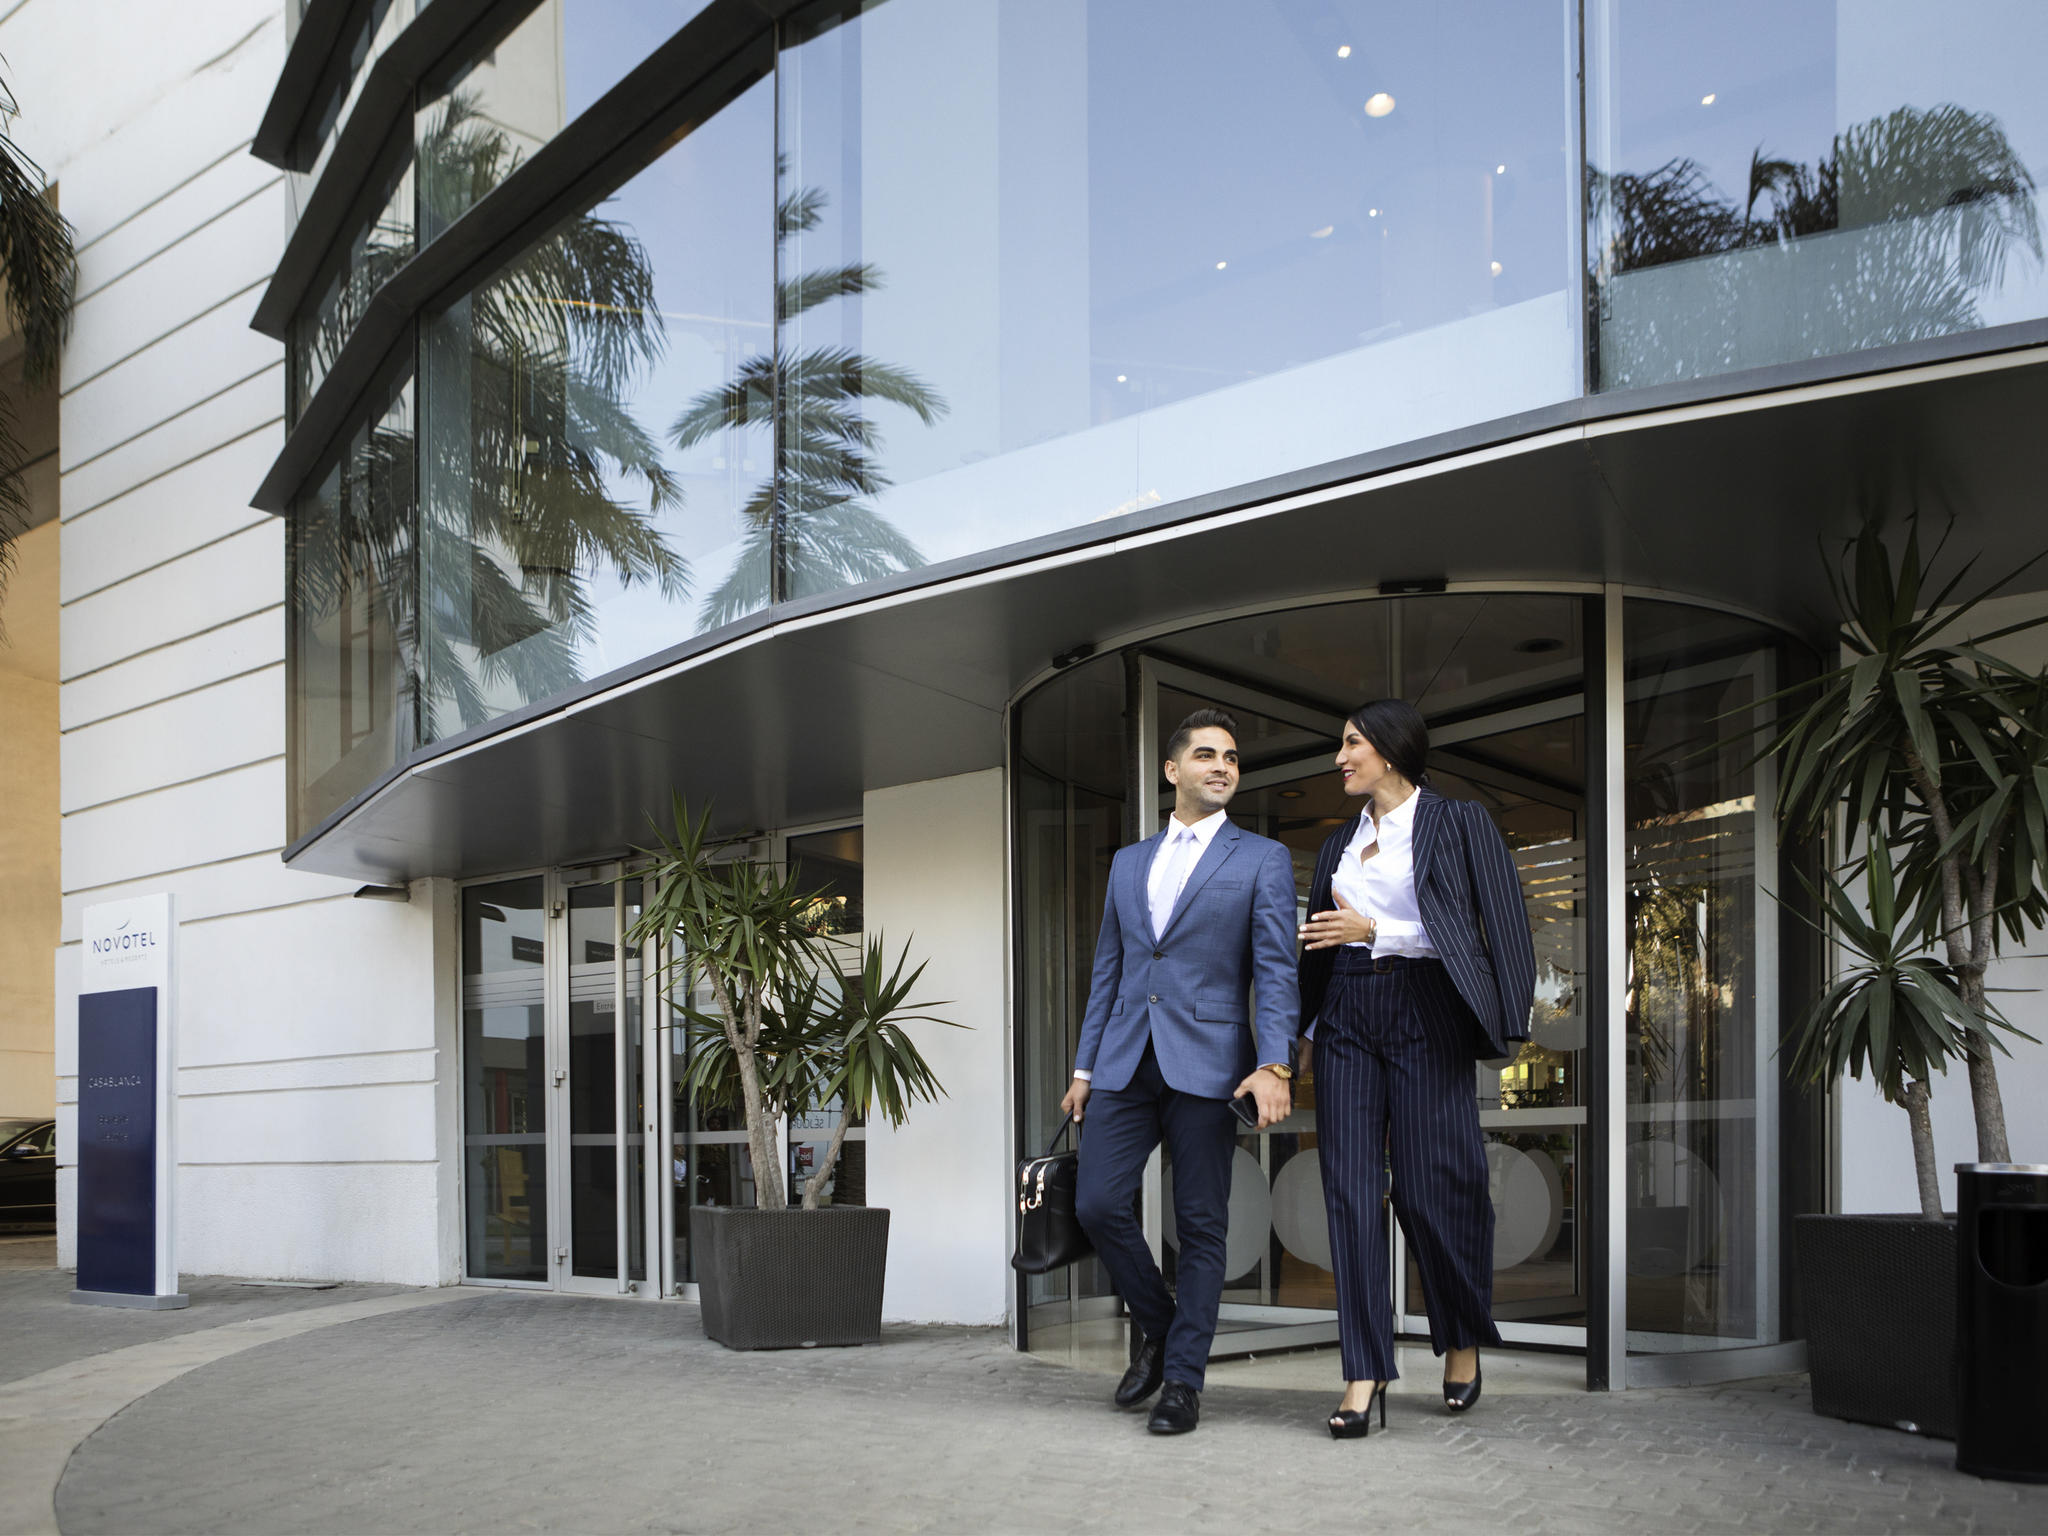 Hotel – Novotel Casablanca City Center